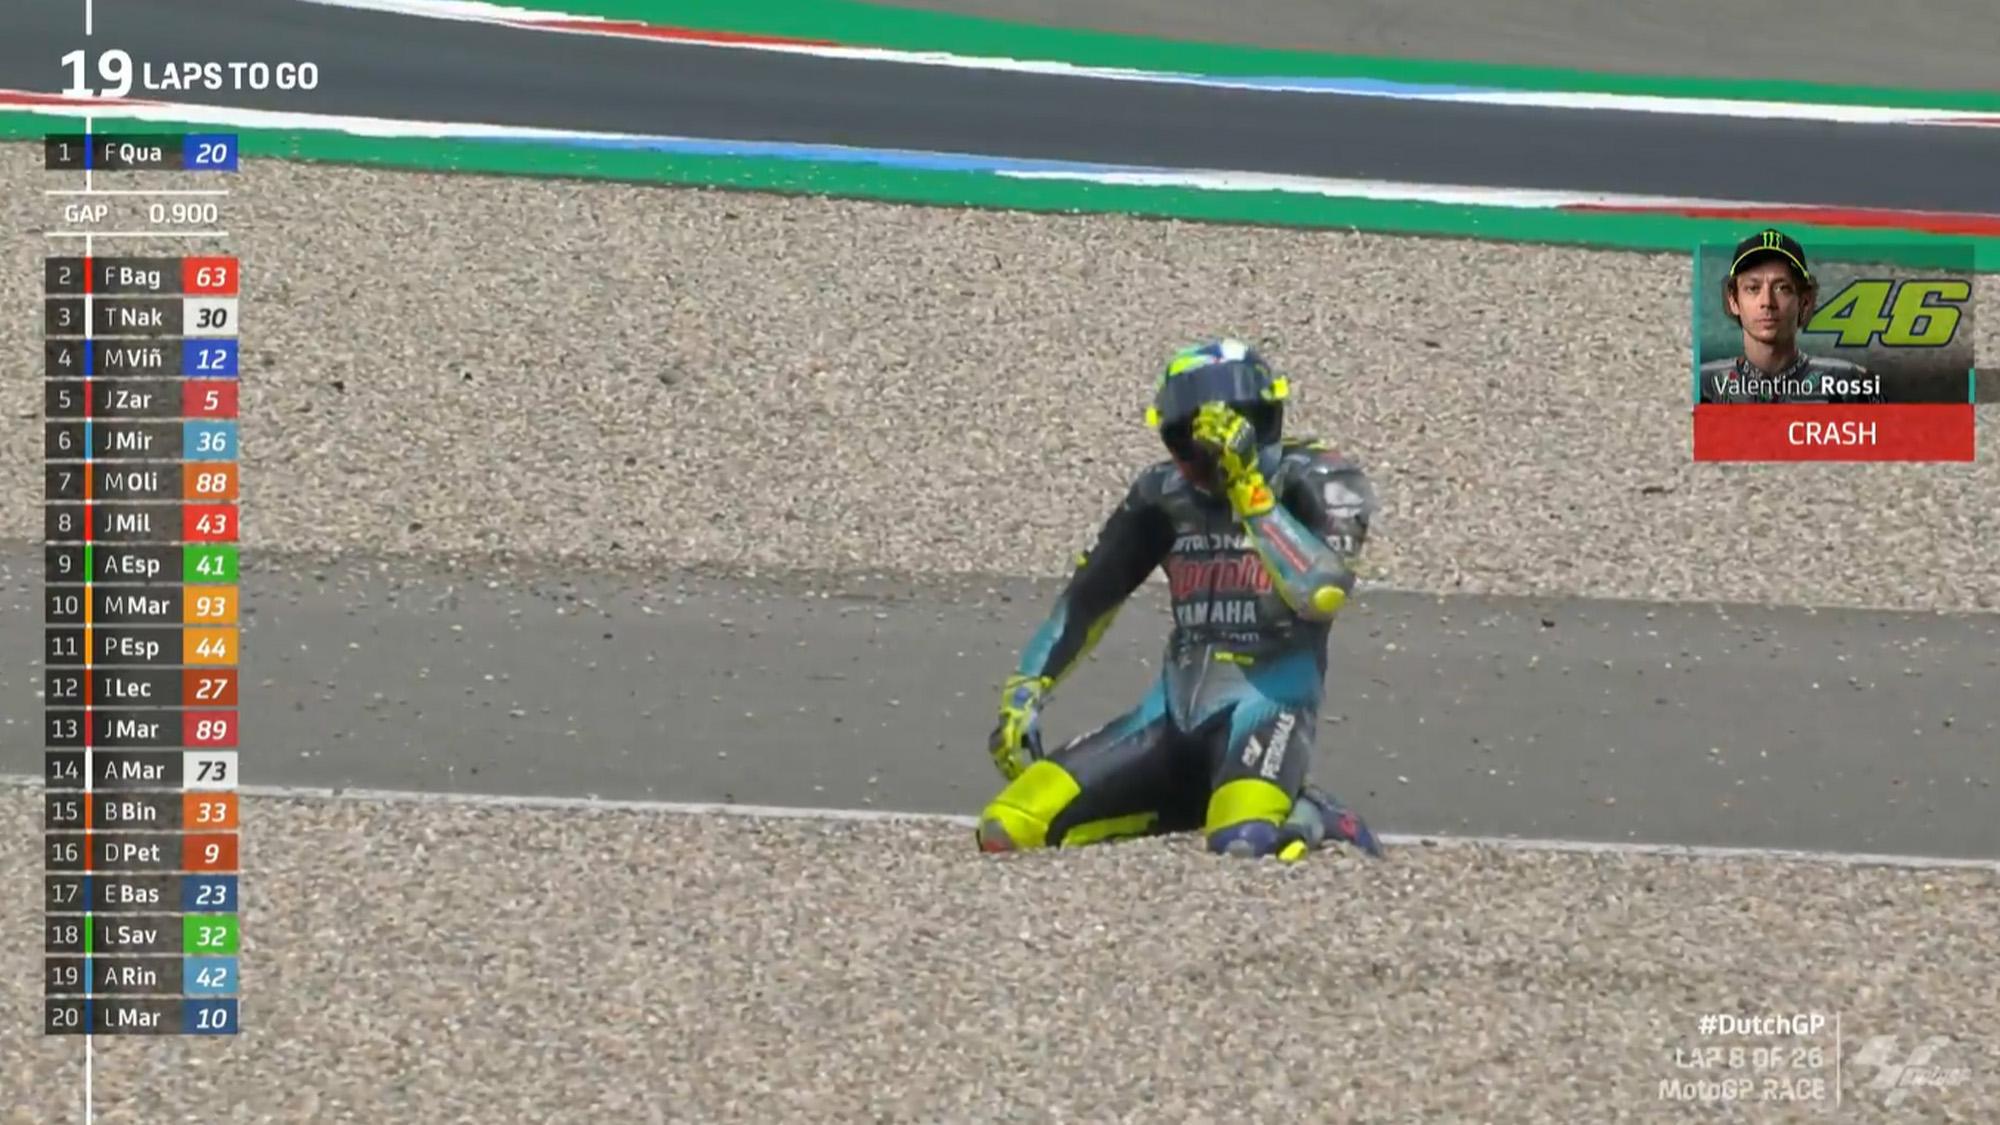 Valentino Rossi kneels after Assen 2021 crash